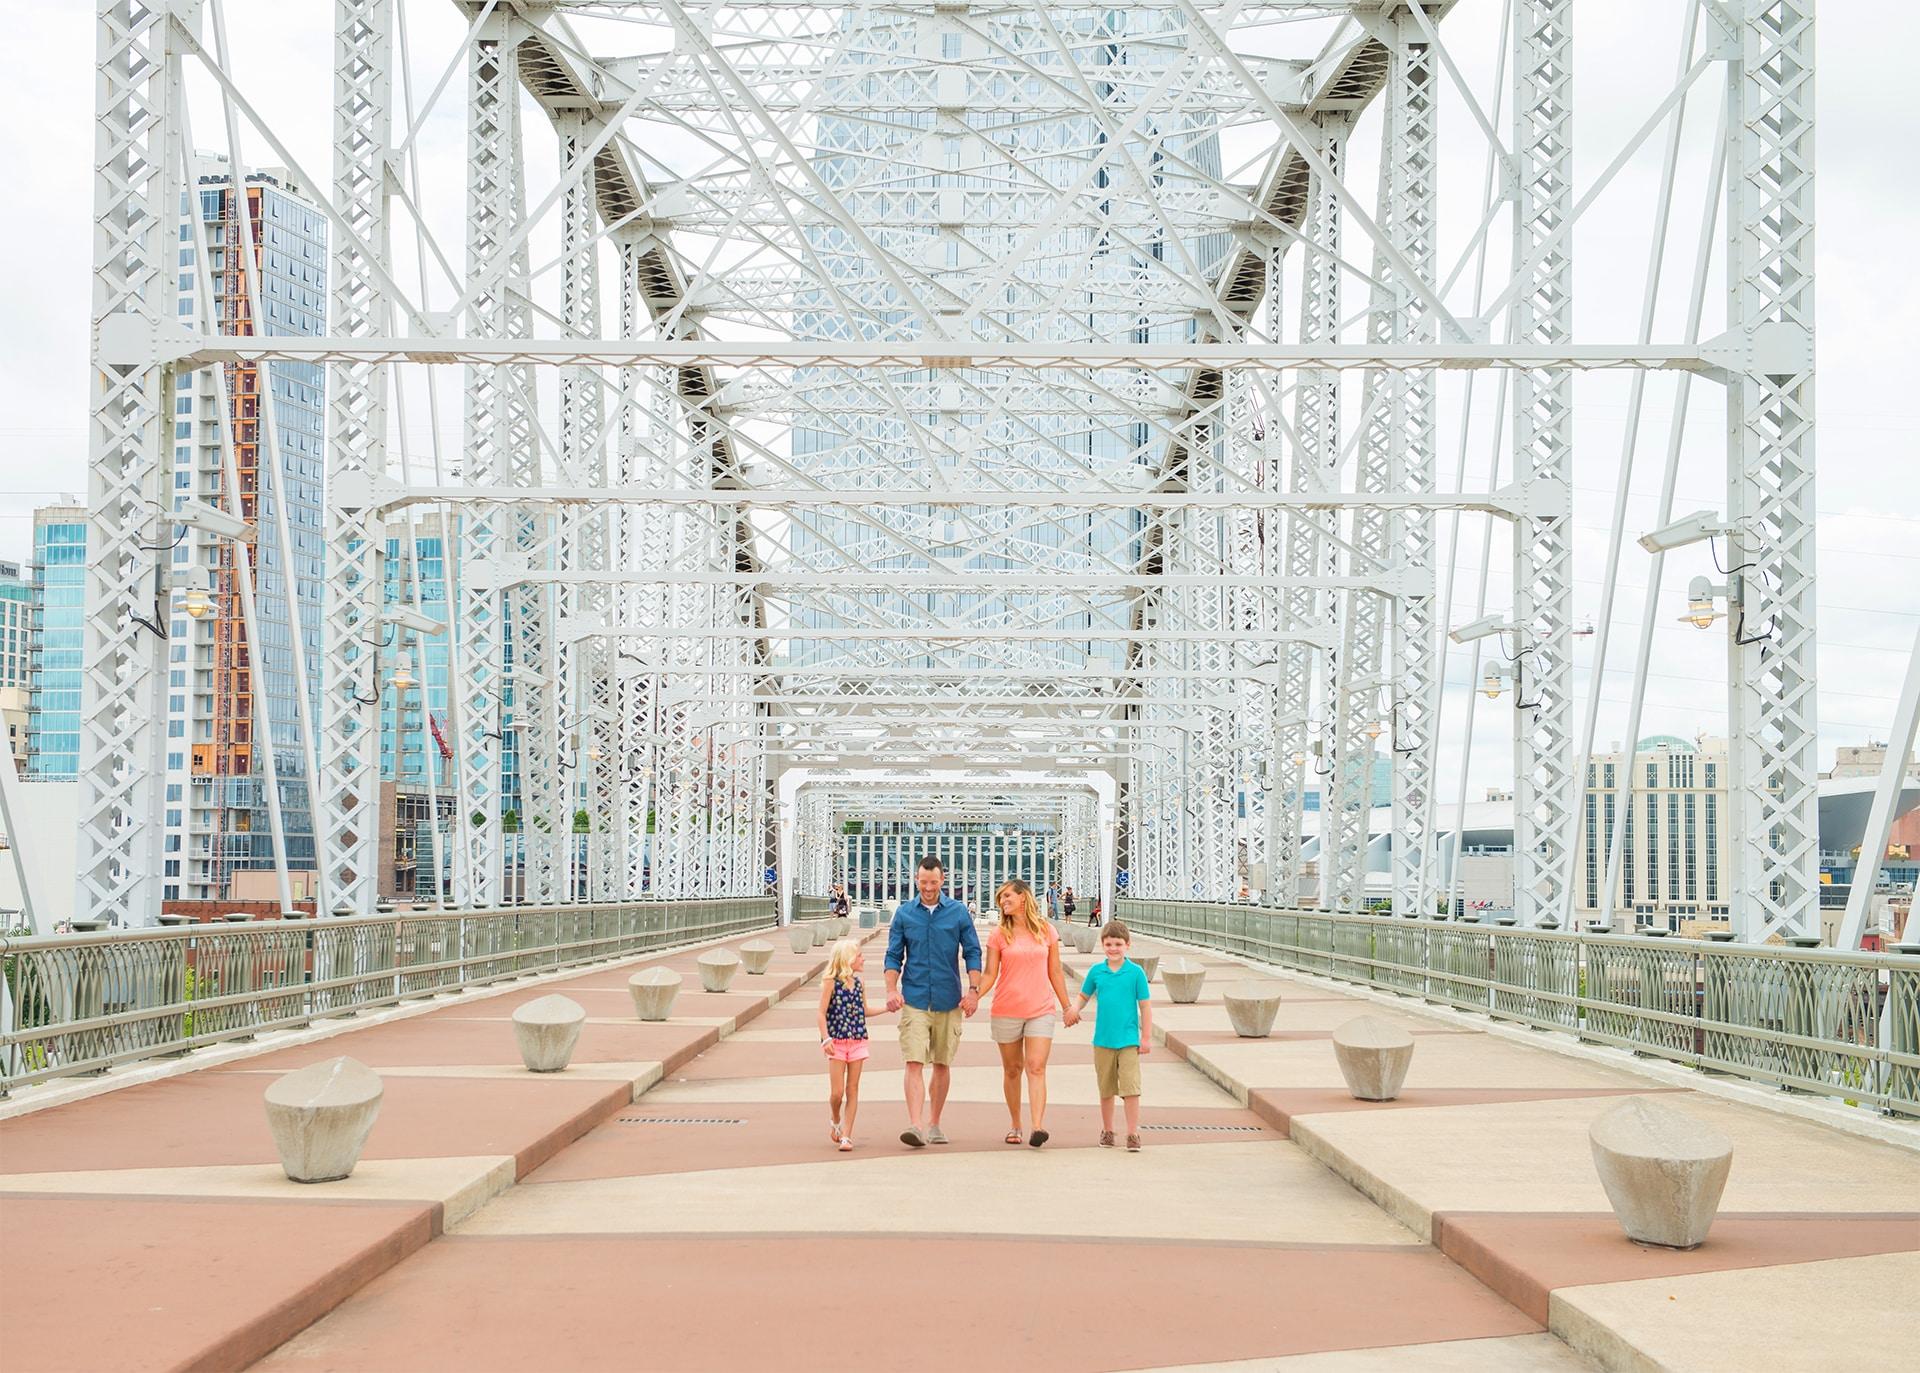 Summer Vacation Ideas for Nashville, Tennessee